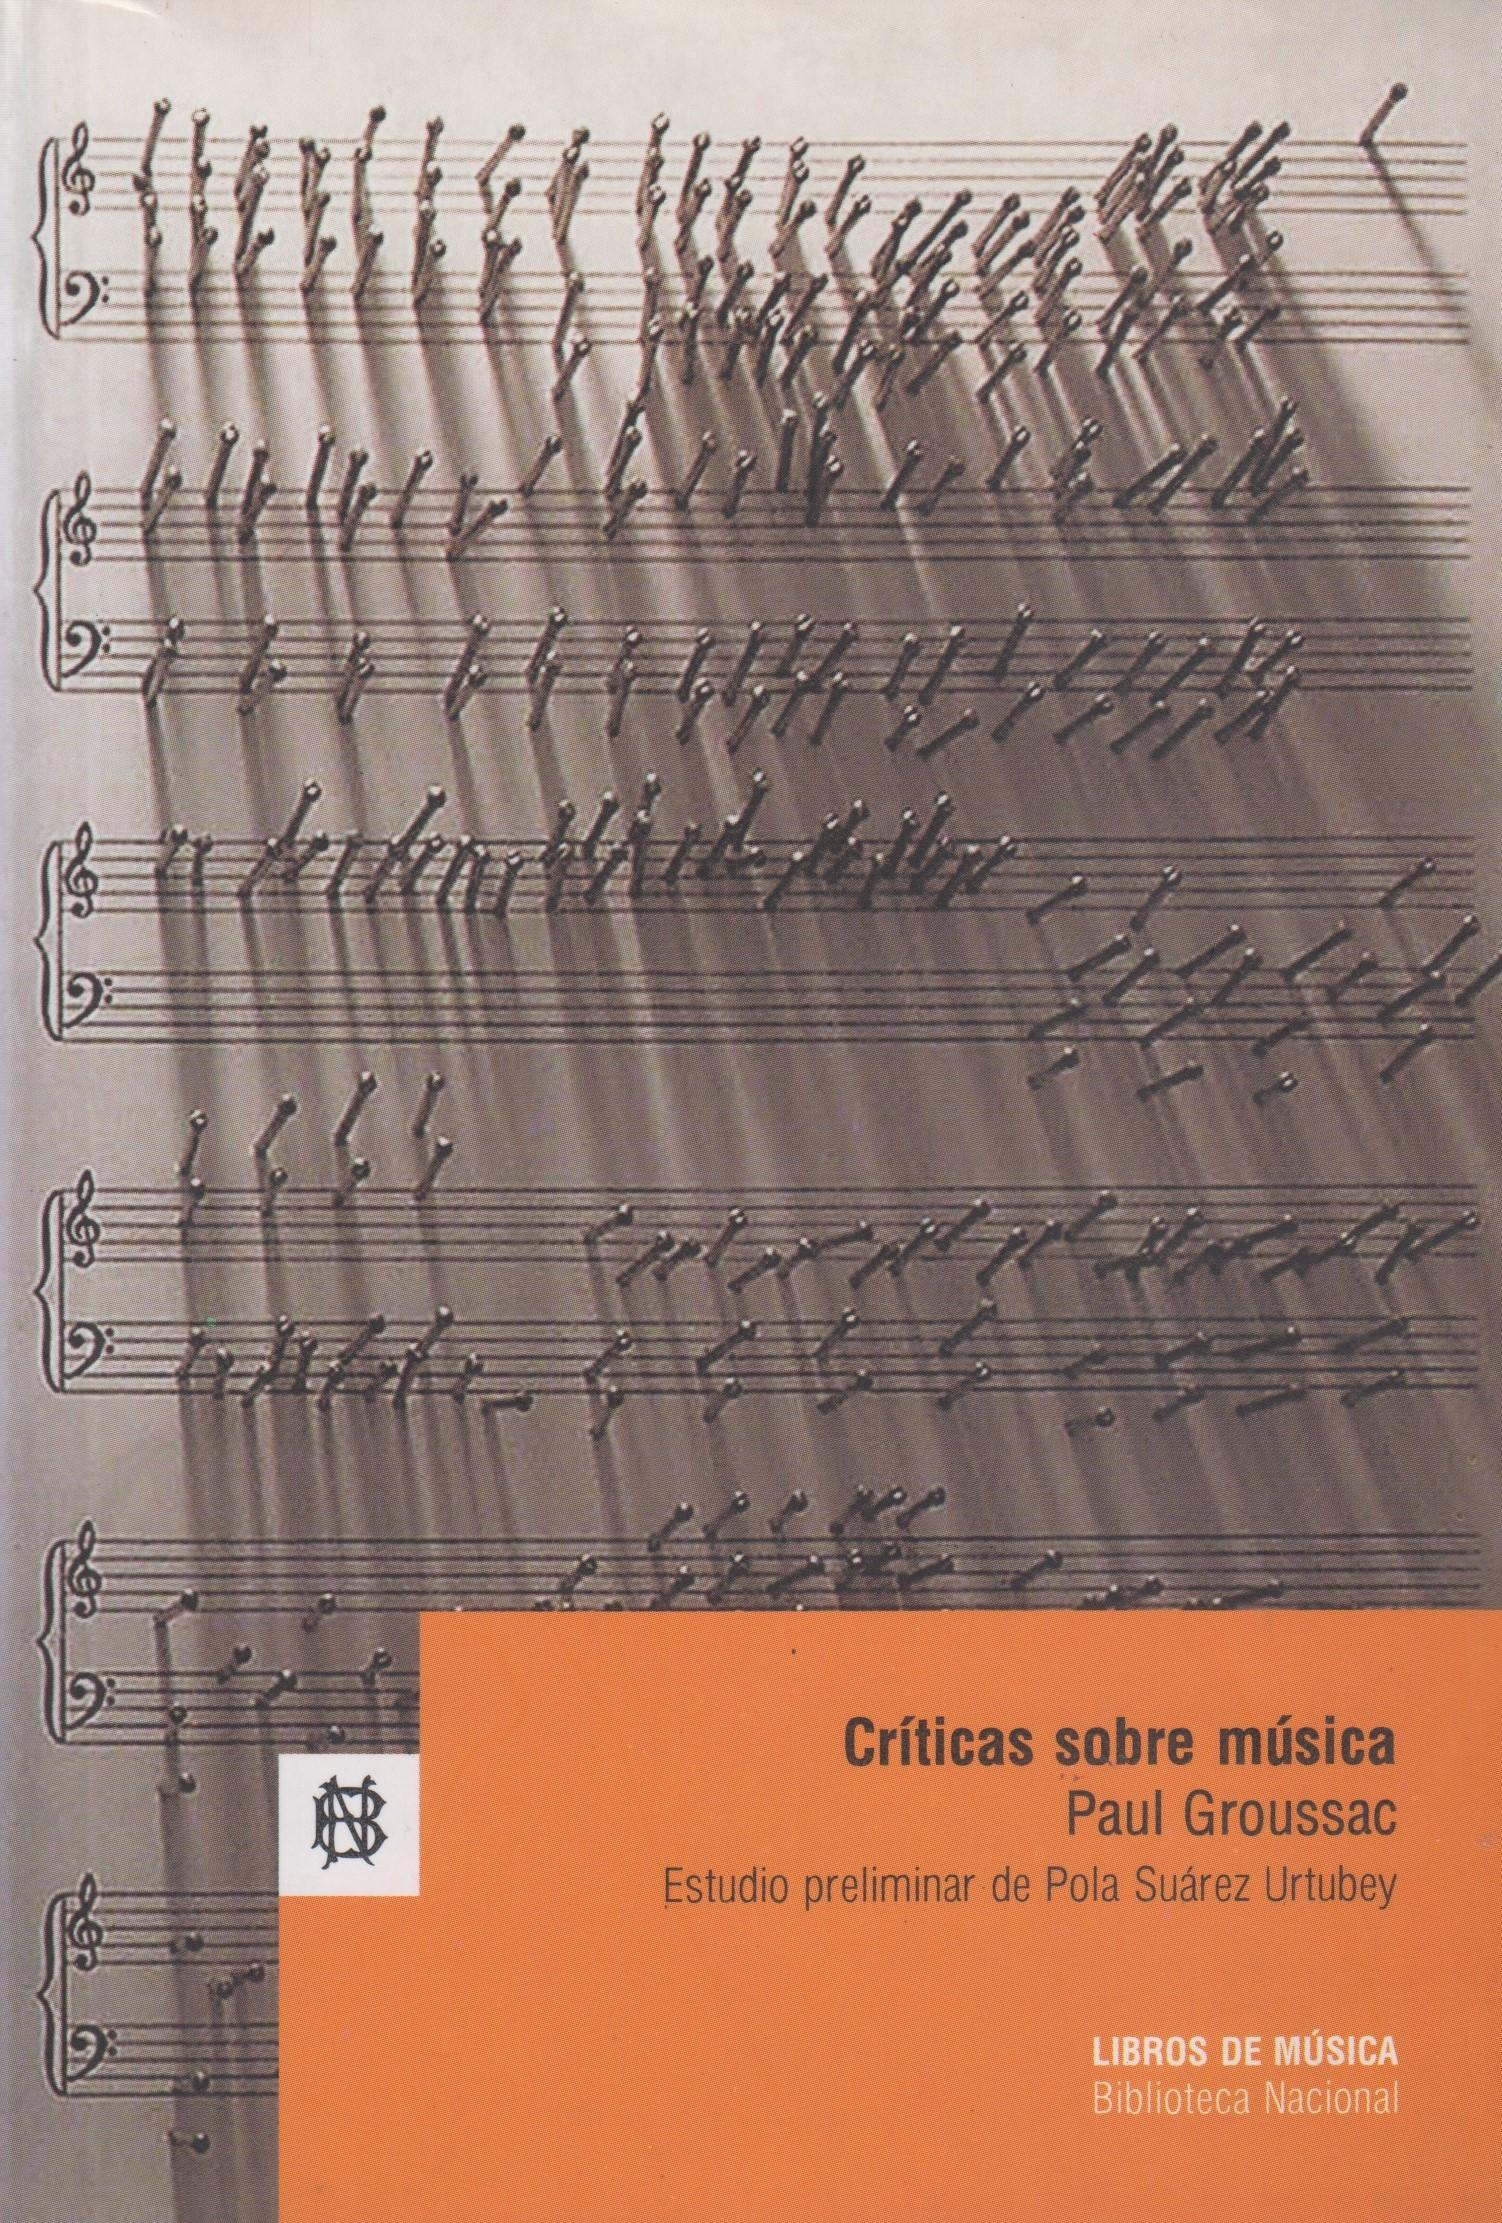 Críticas Sobre Música. Estudio preliminar de Pola Suárez Urtubey